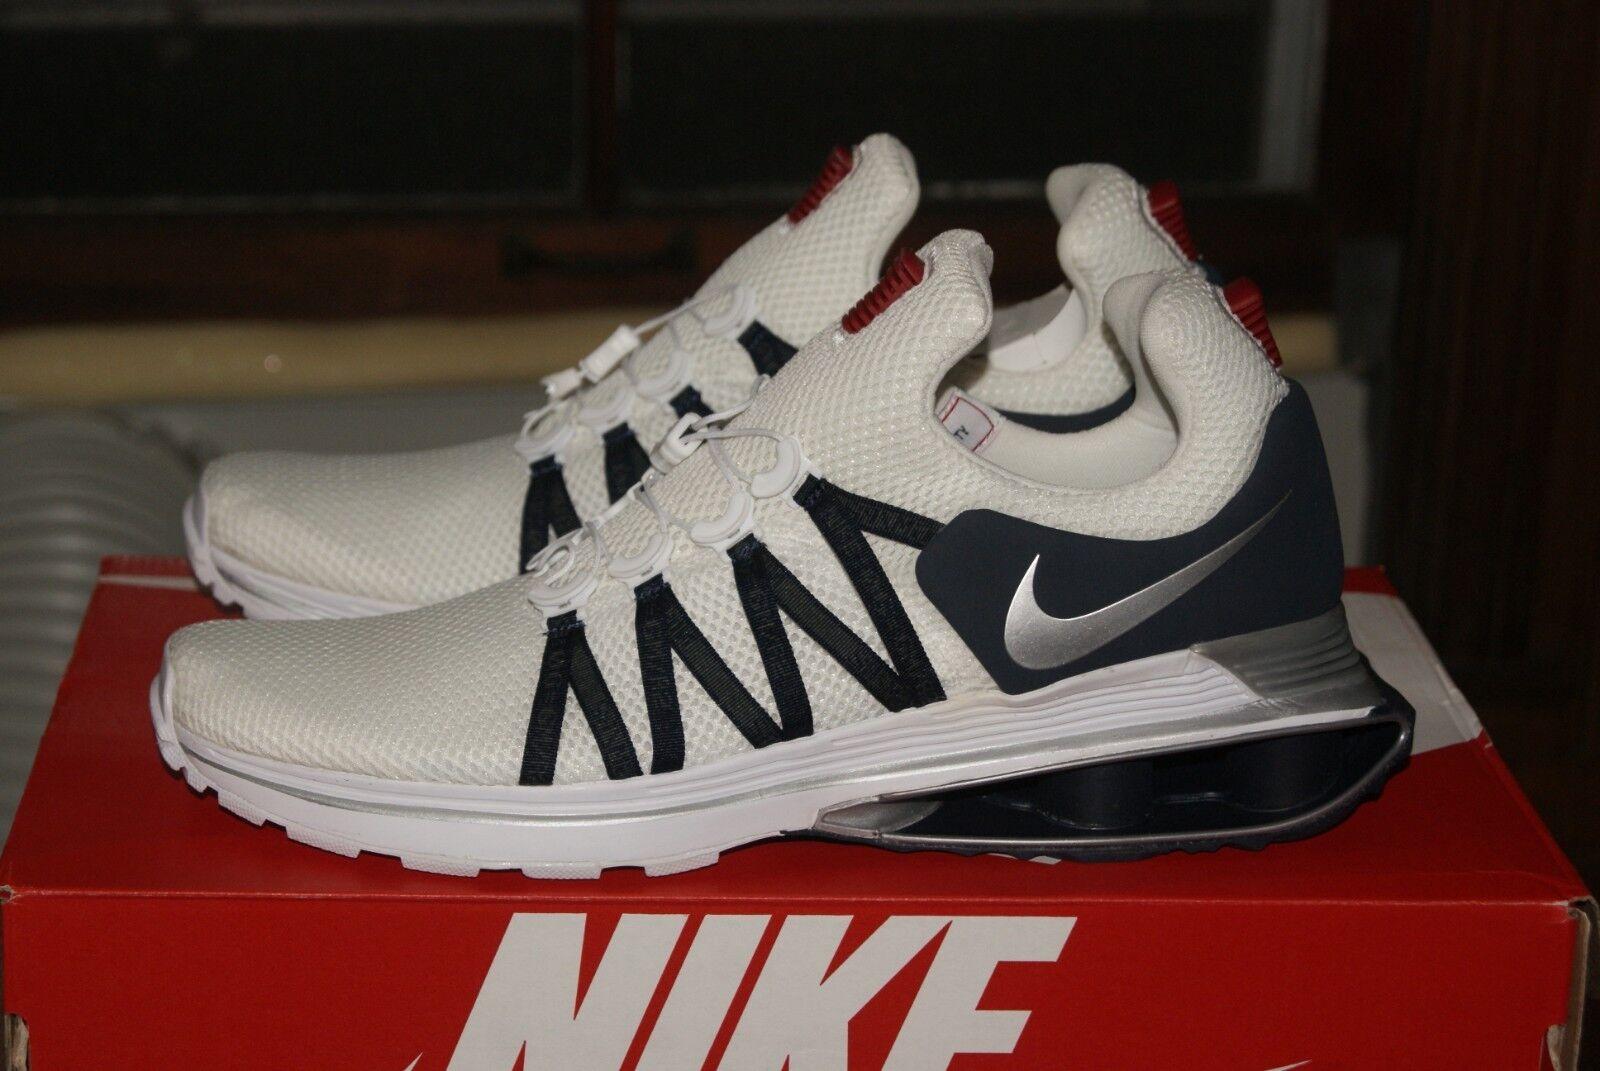 Mens Nike Shox Gravity White Silver blueee 9 10 10.5 11 11.5 12 AR1999 Run Walk